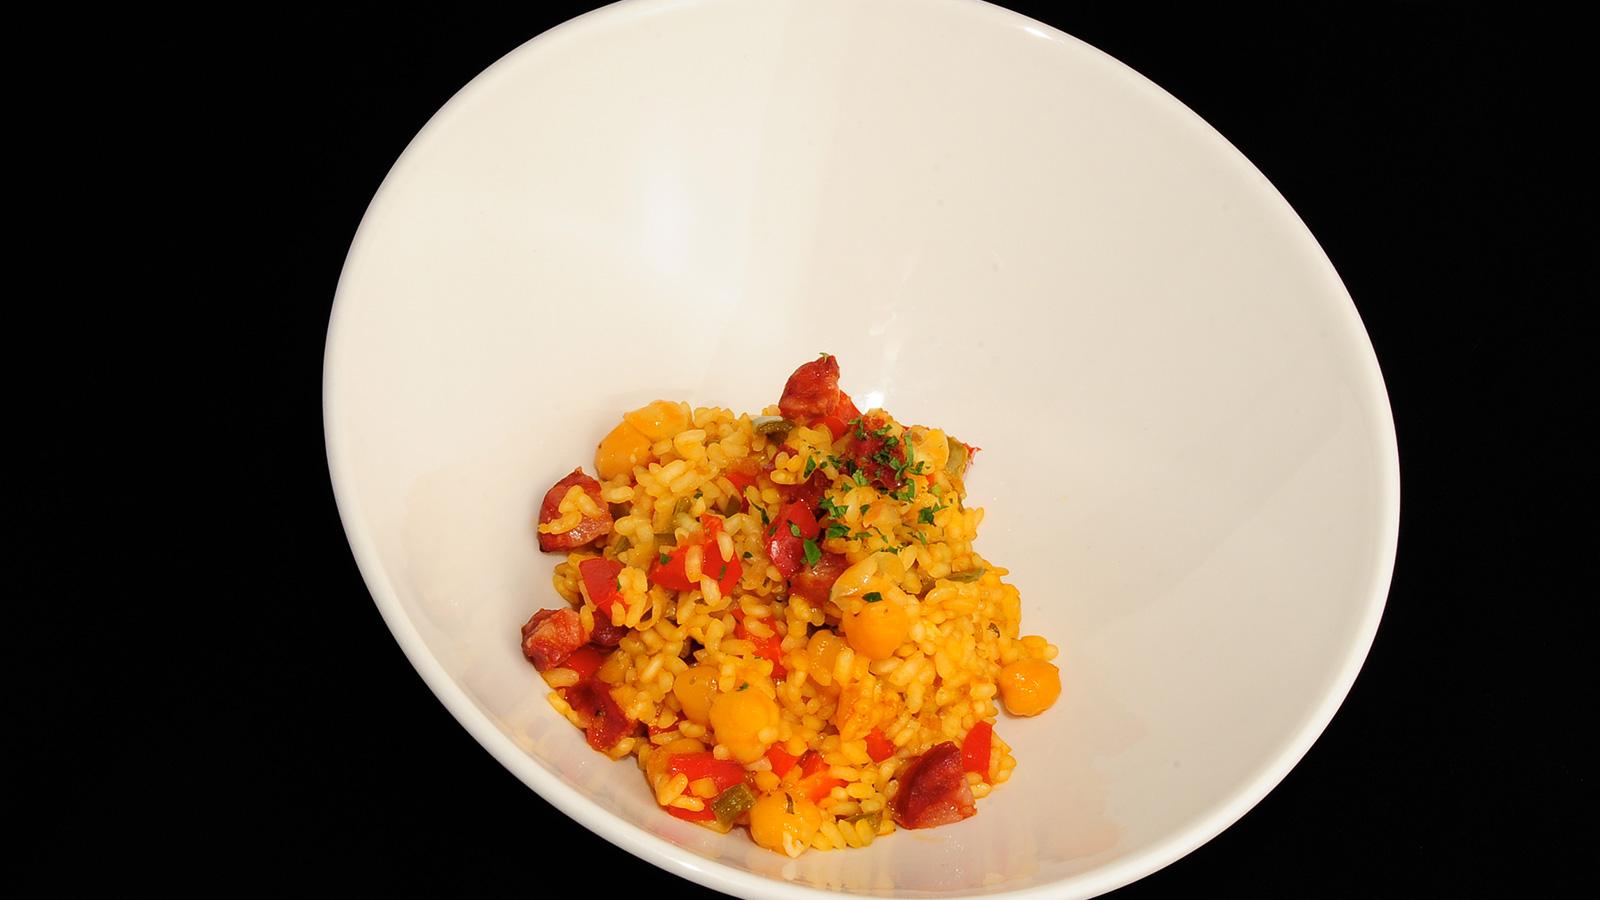 Garbanzos con arroz sergio fern ndez receta canal cocina for Canal cocina sergio fernandez